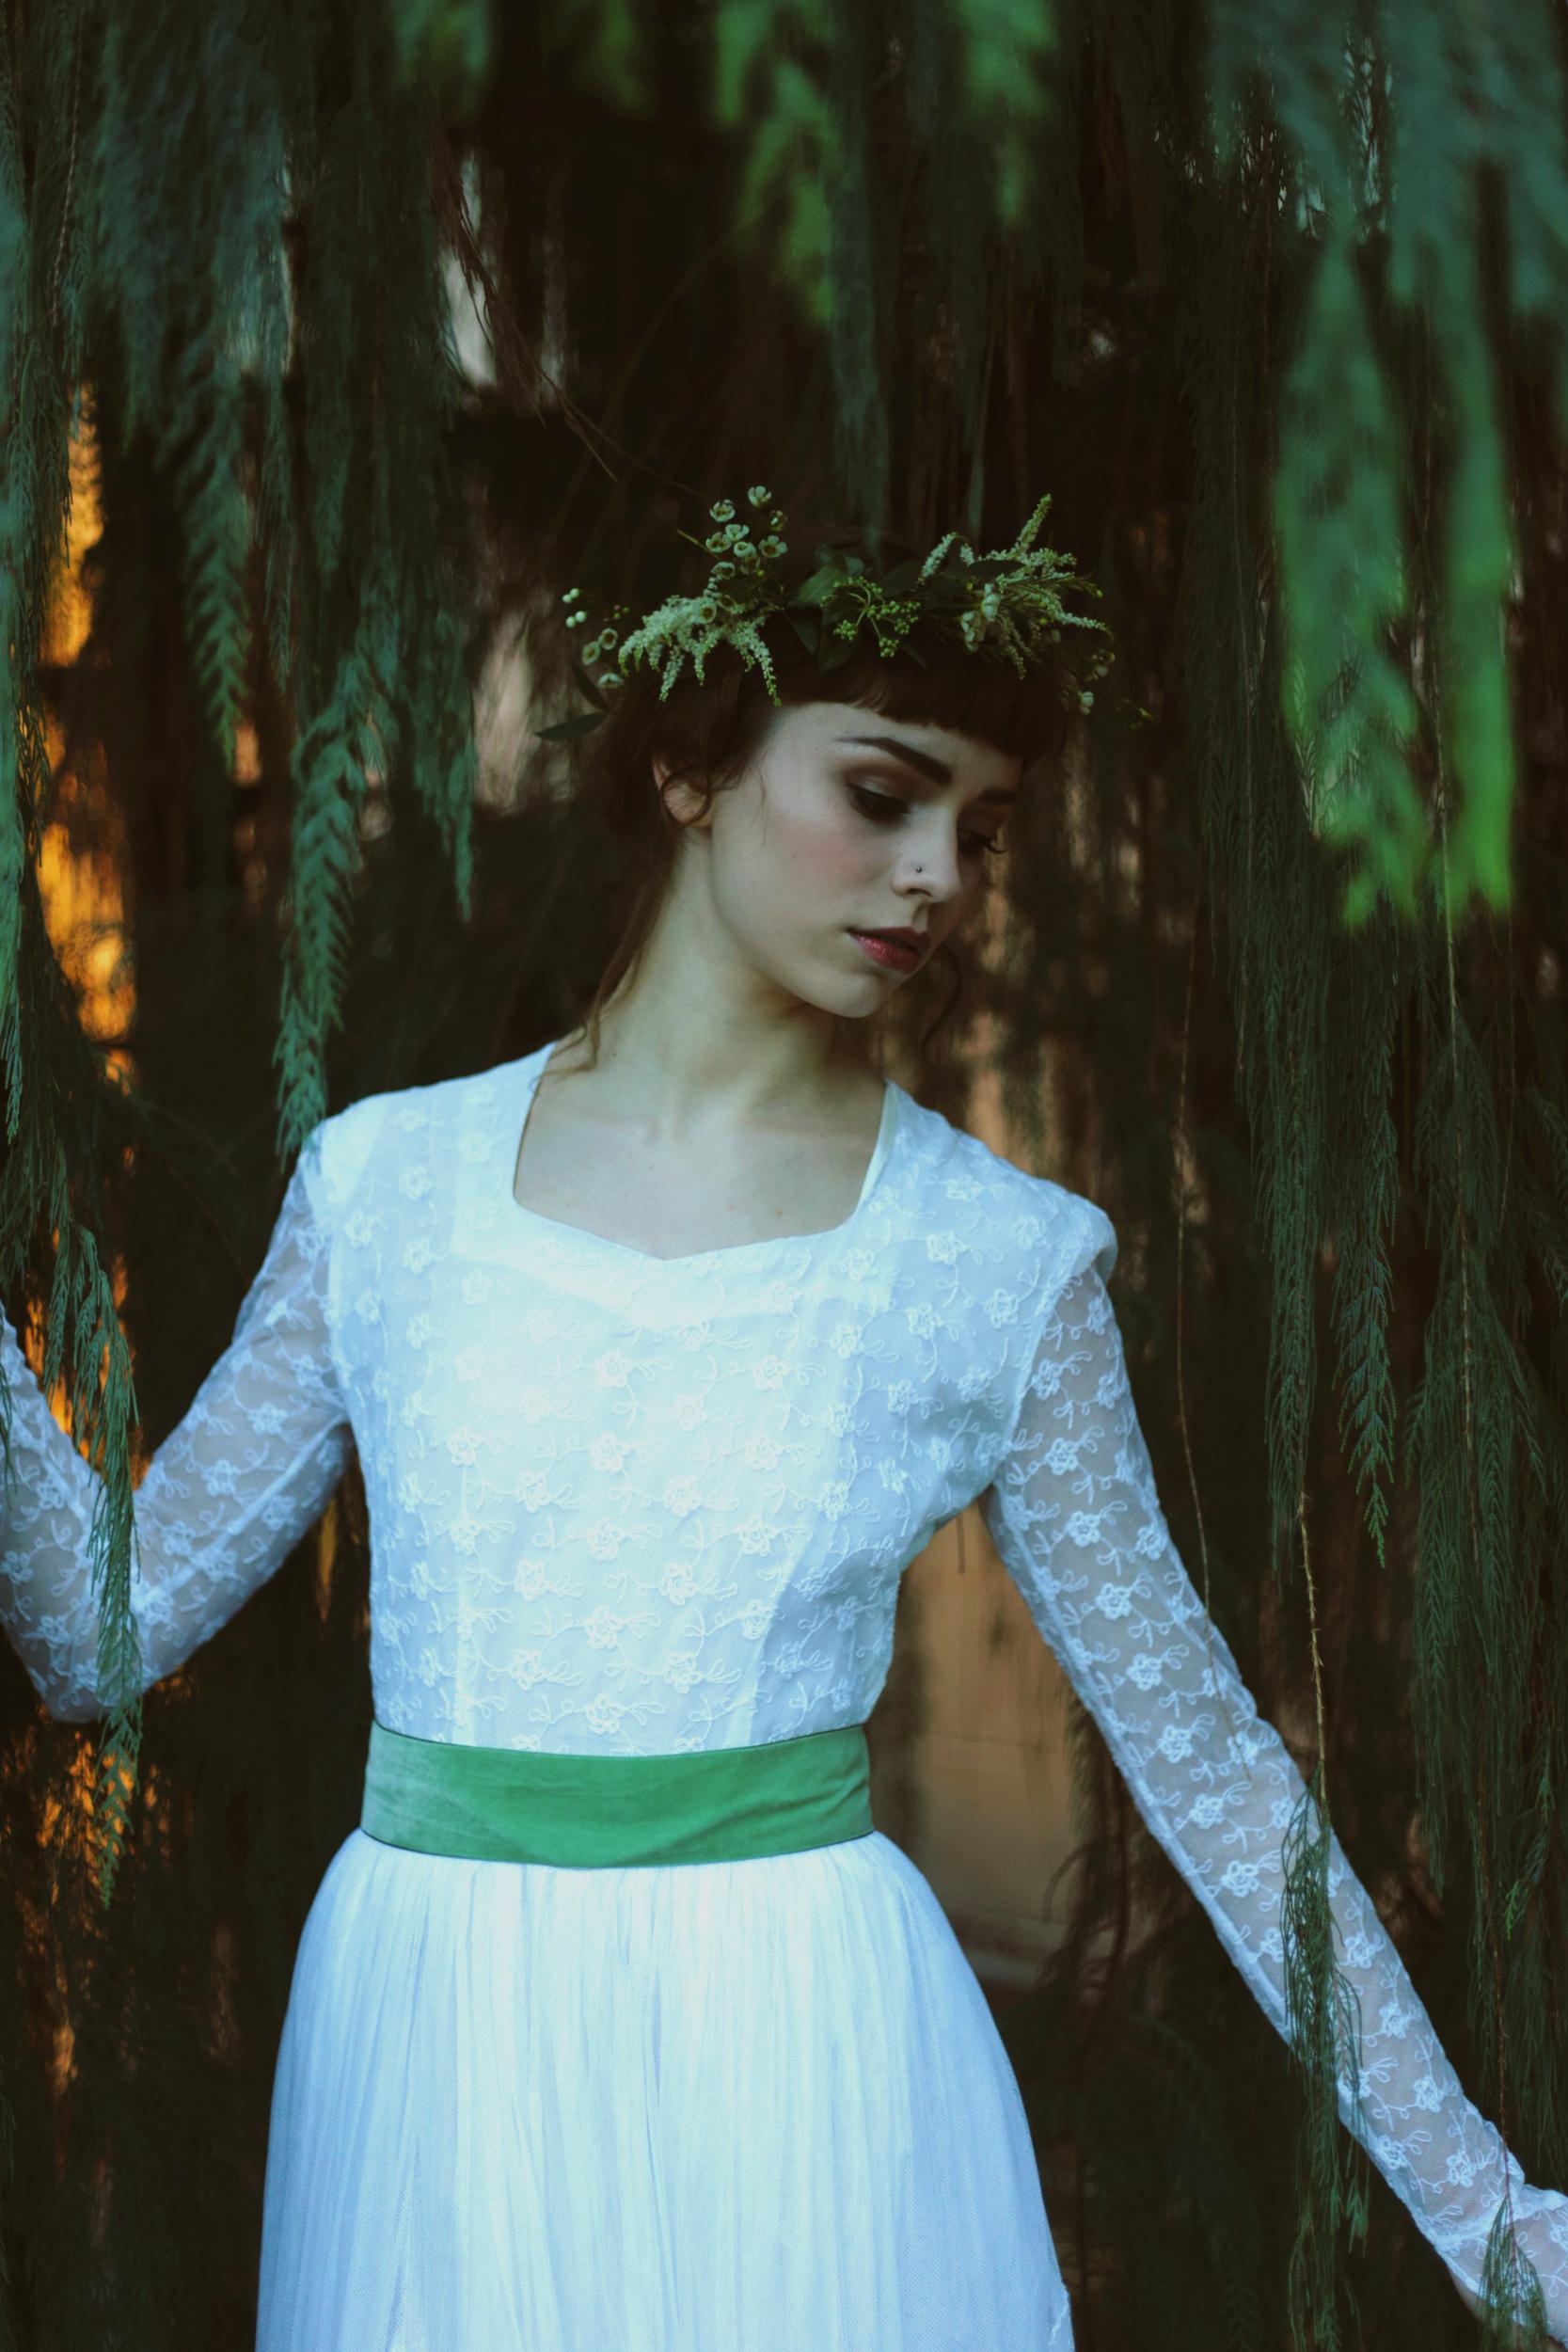 Winter-Bridal-Kate-Beaumont-Shelley-Richmond-Vintage-Wedding-Dress-21.jpg